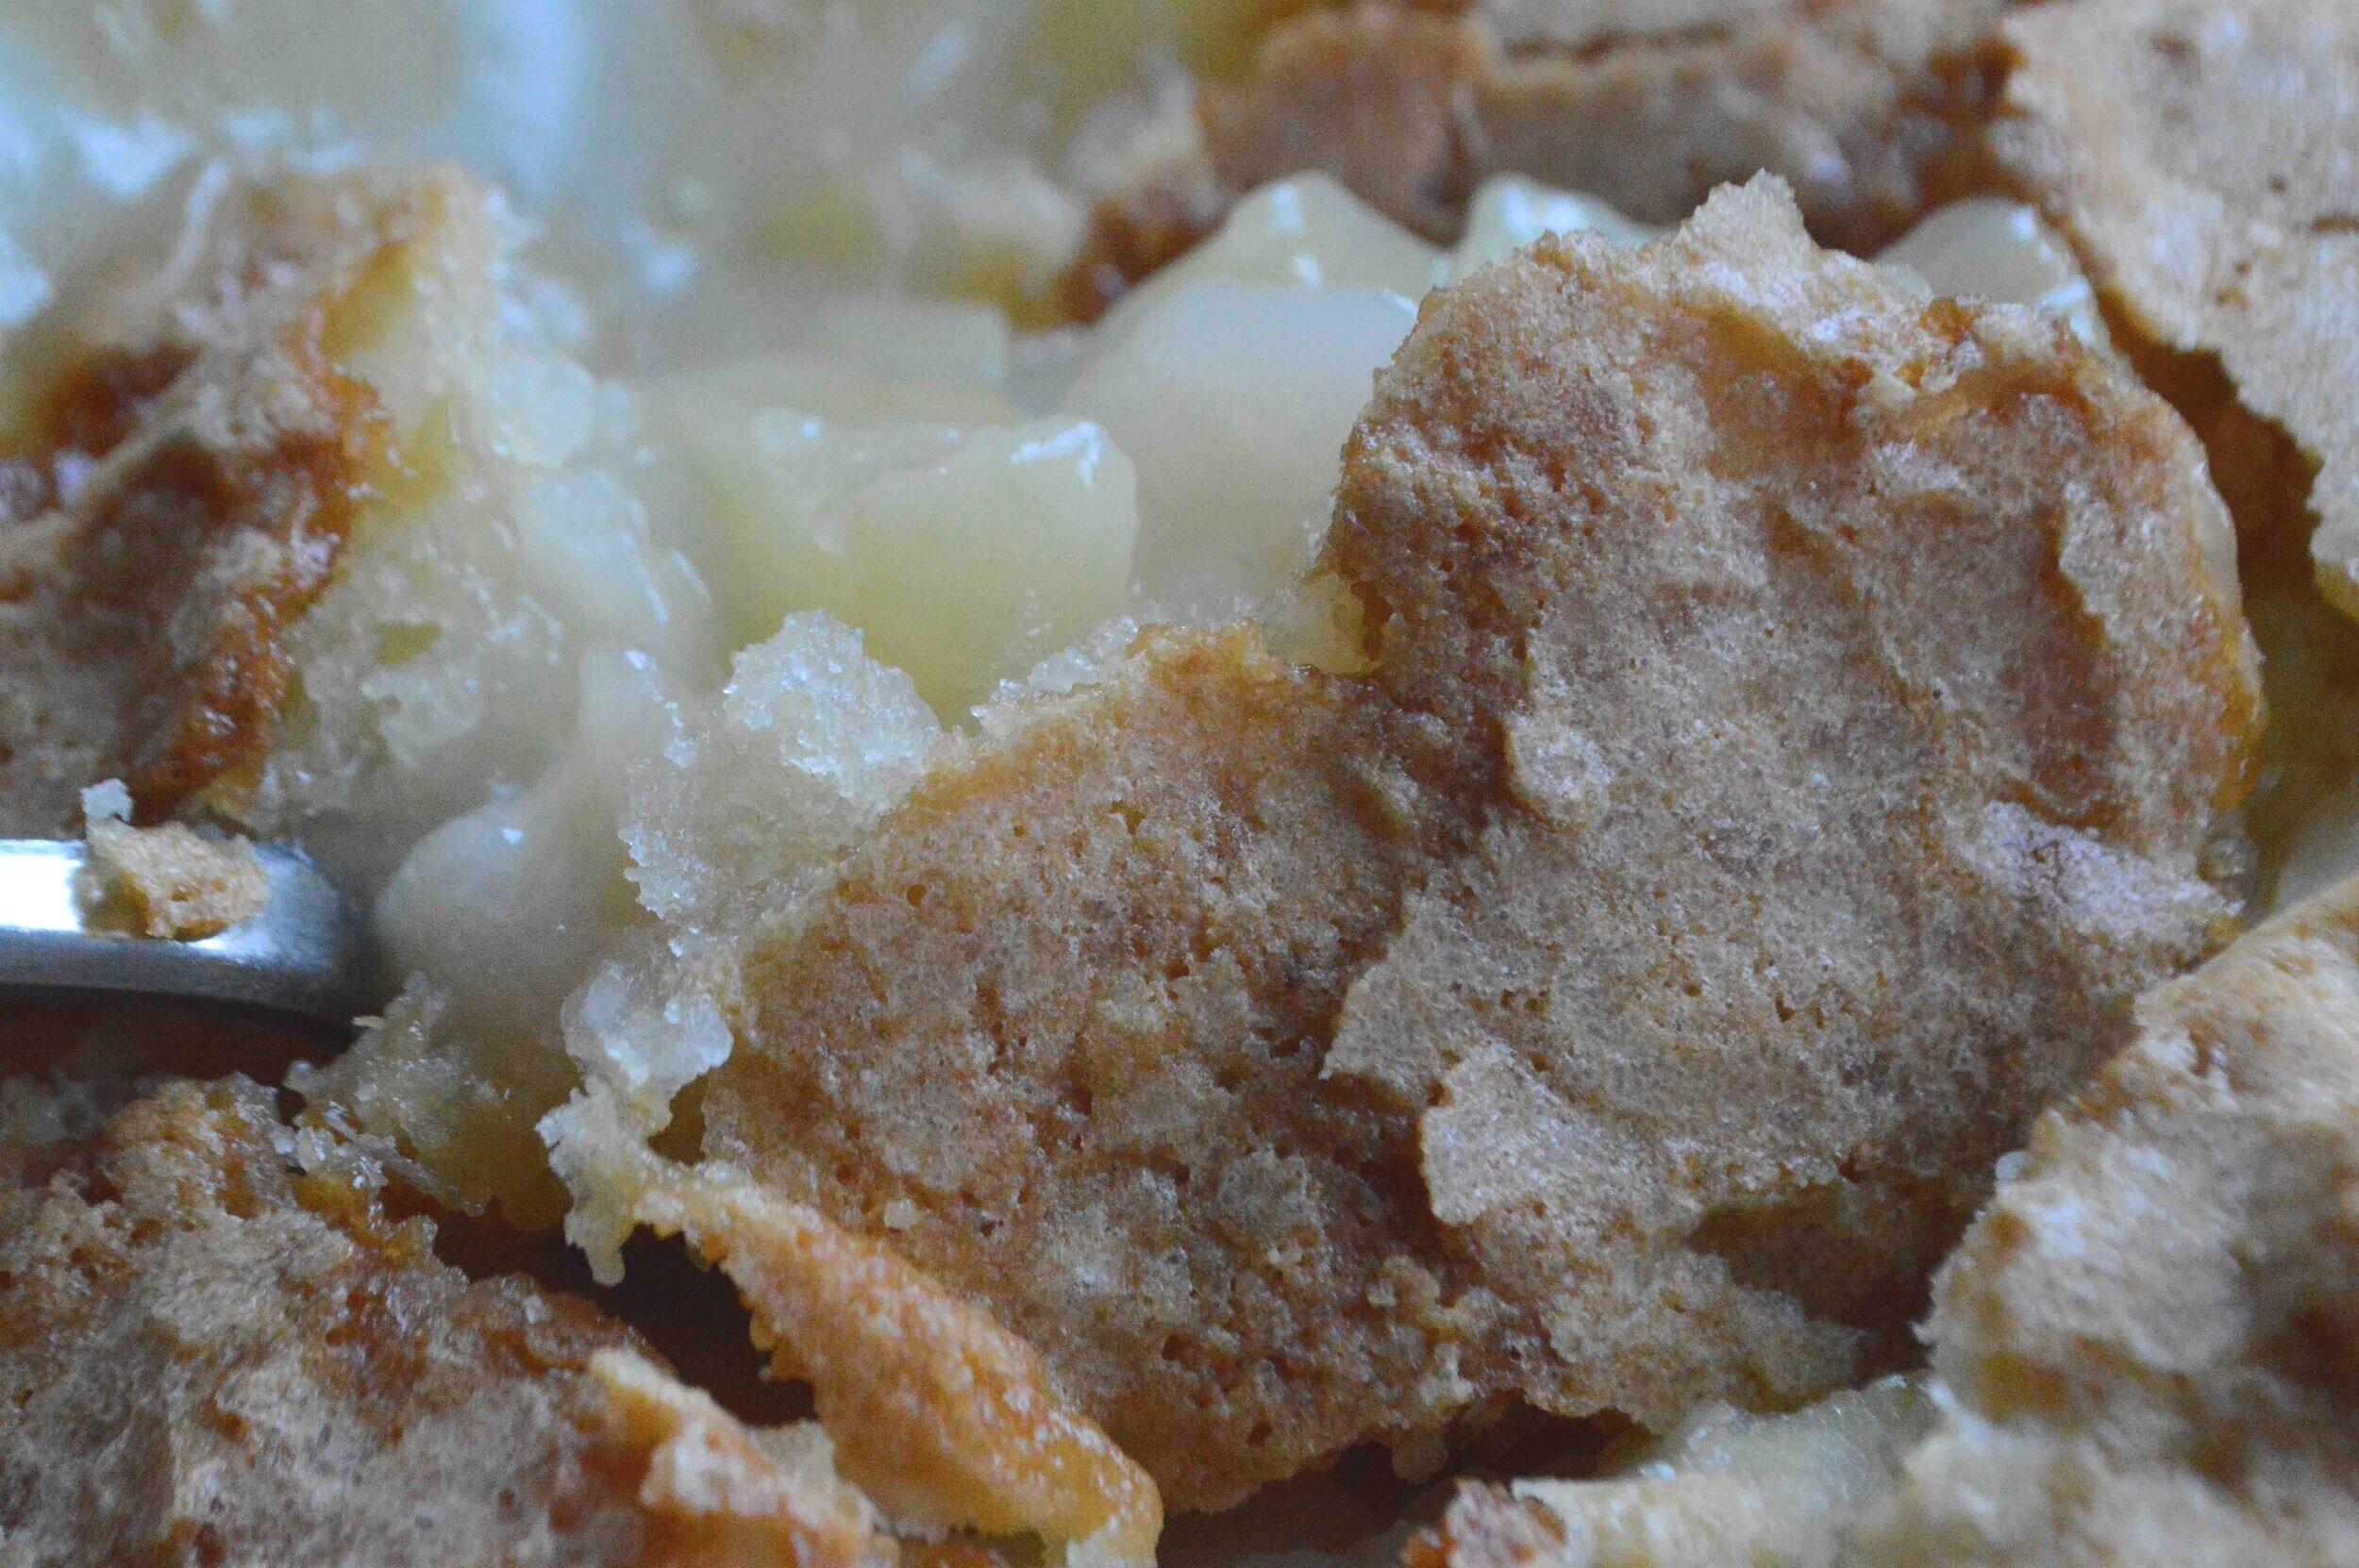 Apple+Cobbler+with+Hot+Sugar+Crust